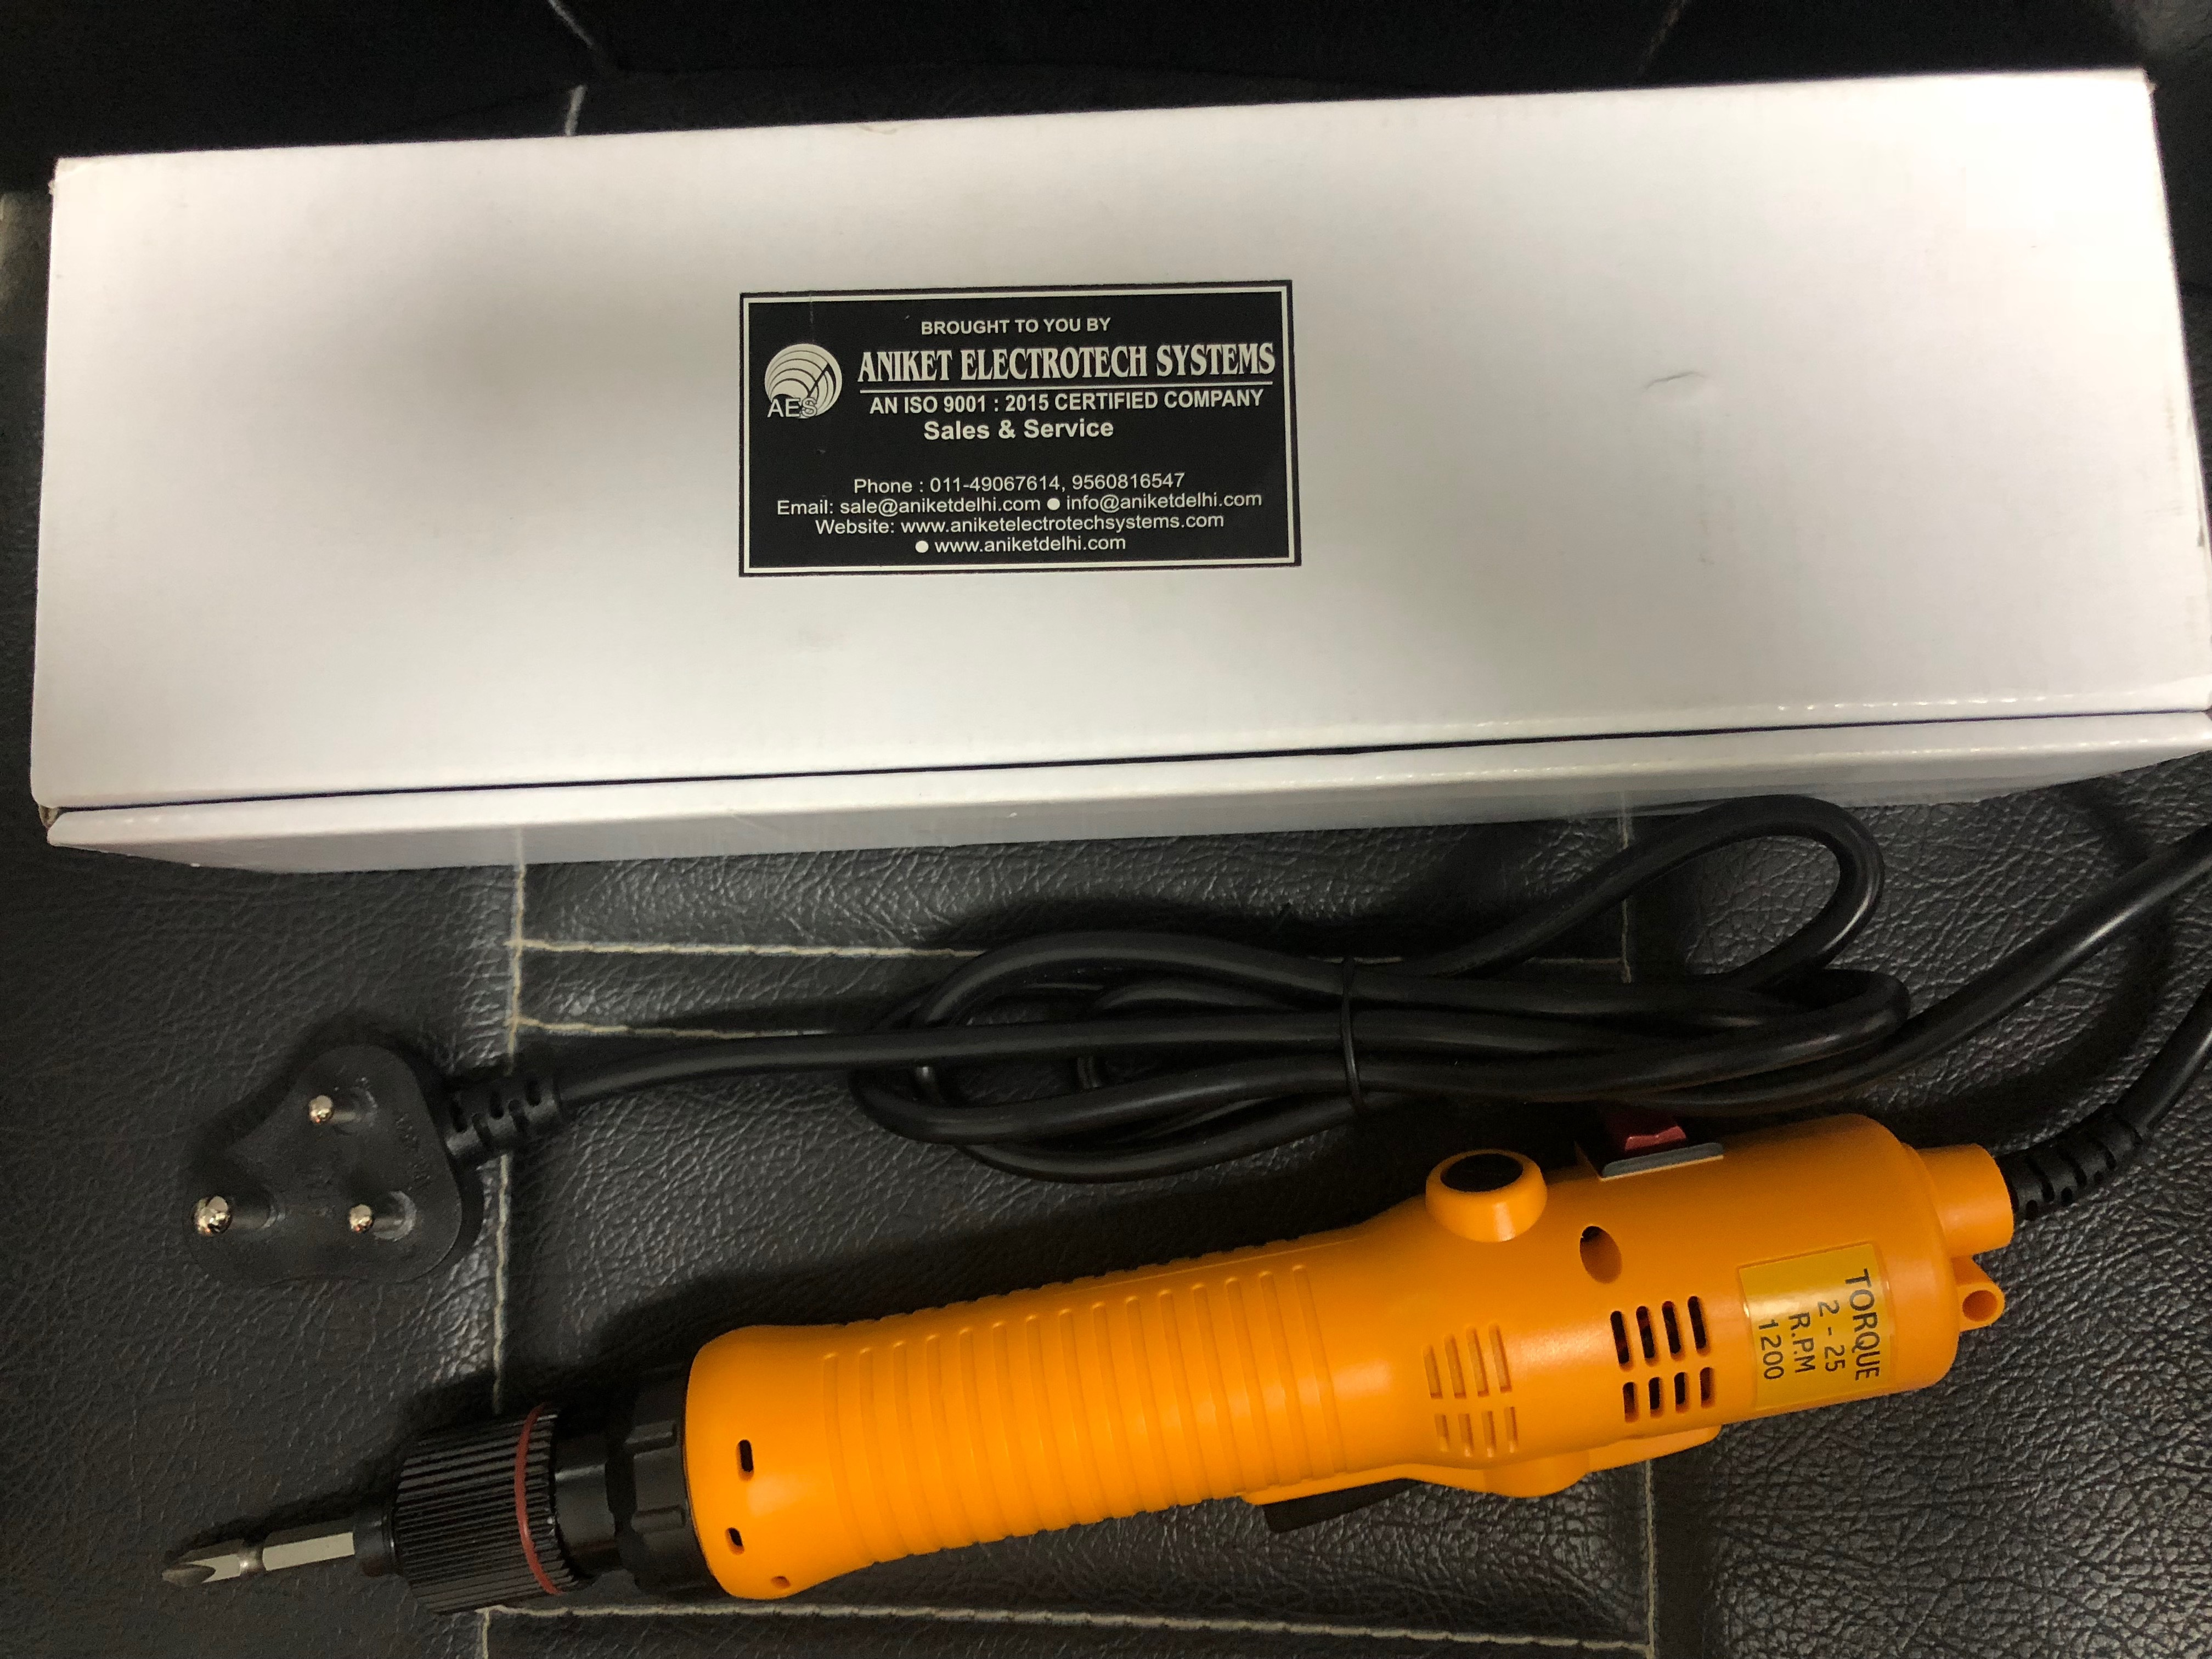 Electric Screwdrivers Kilews